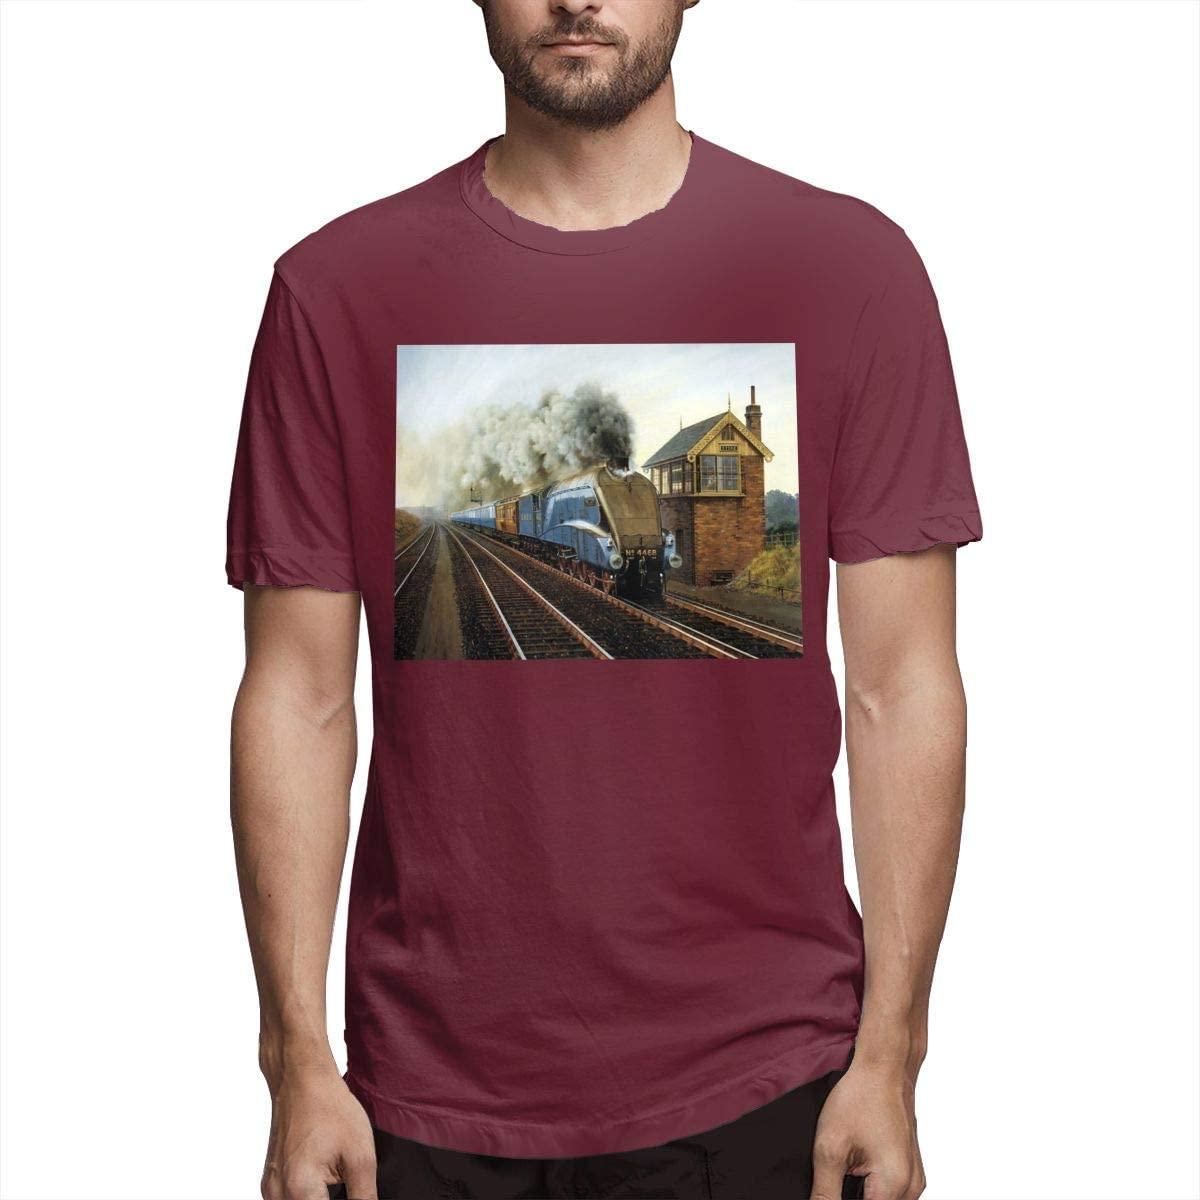 N/C Retro Train Locomotive Steam Train T-Shirt